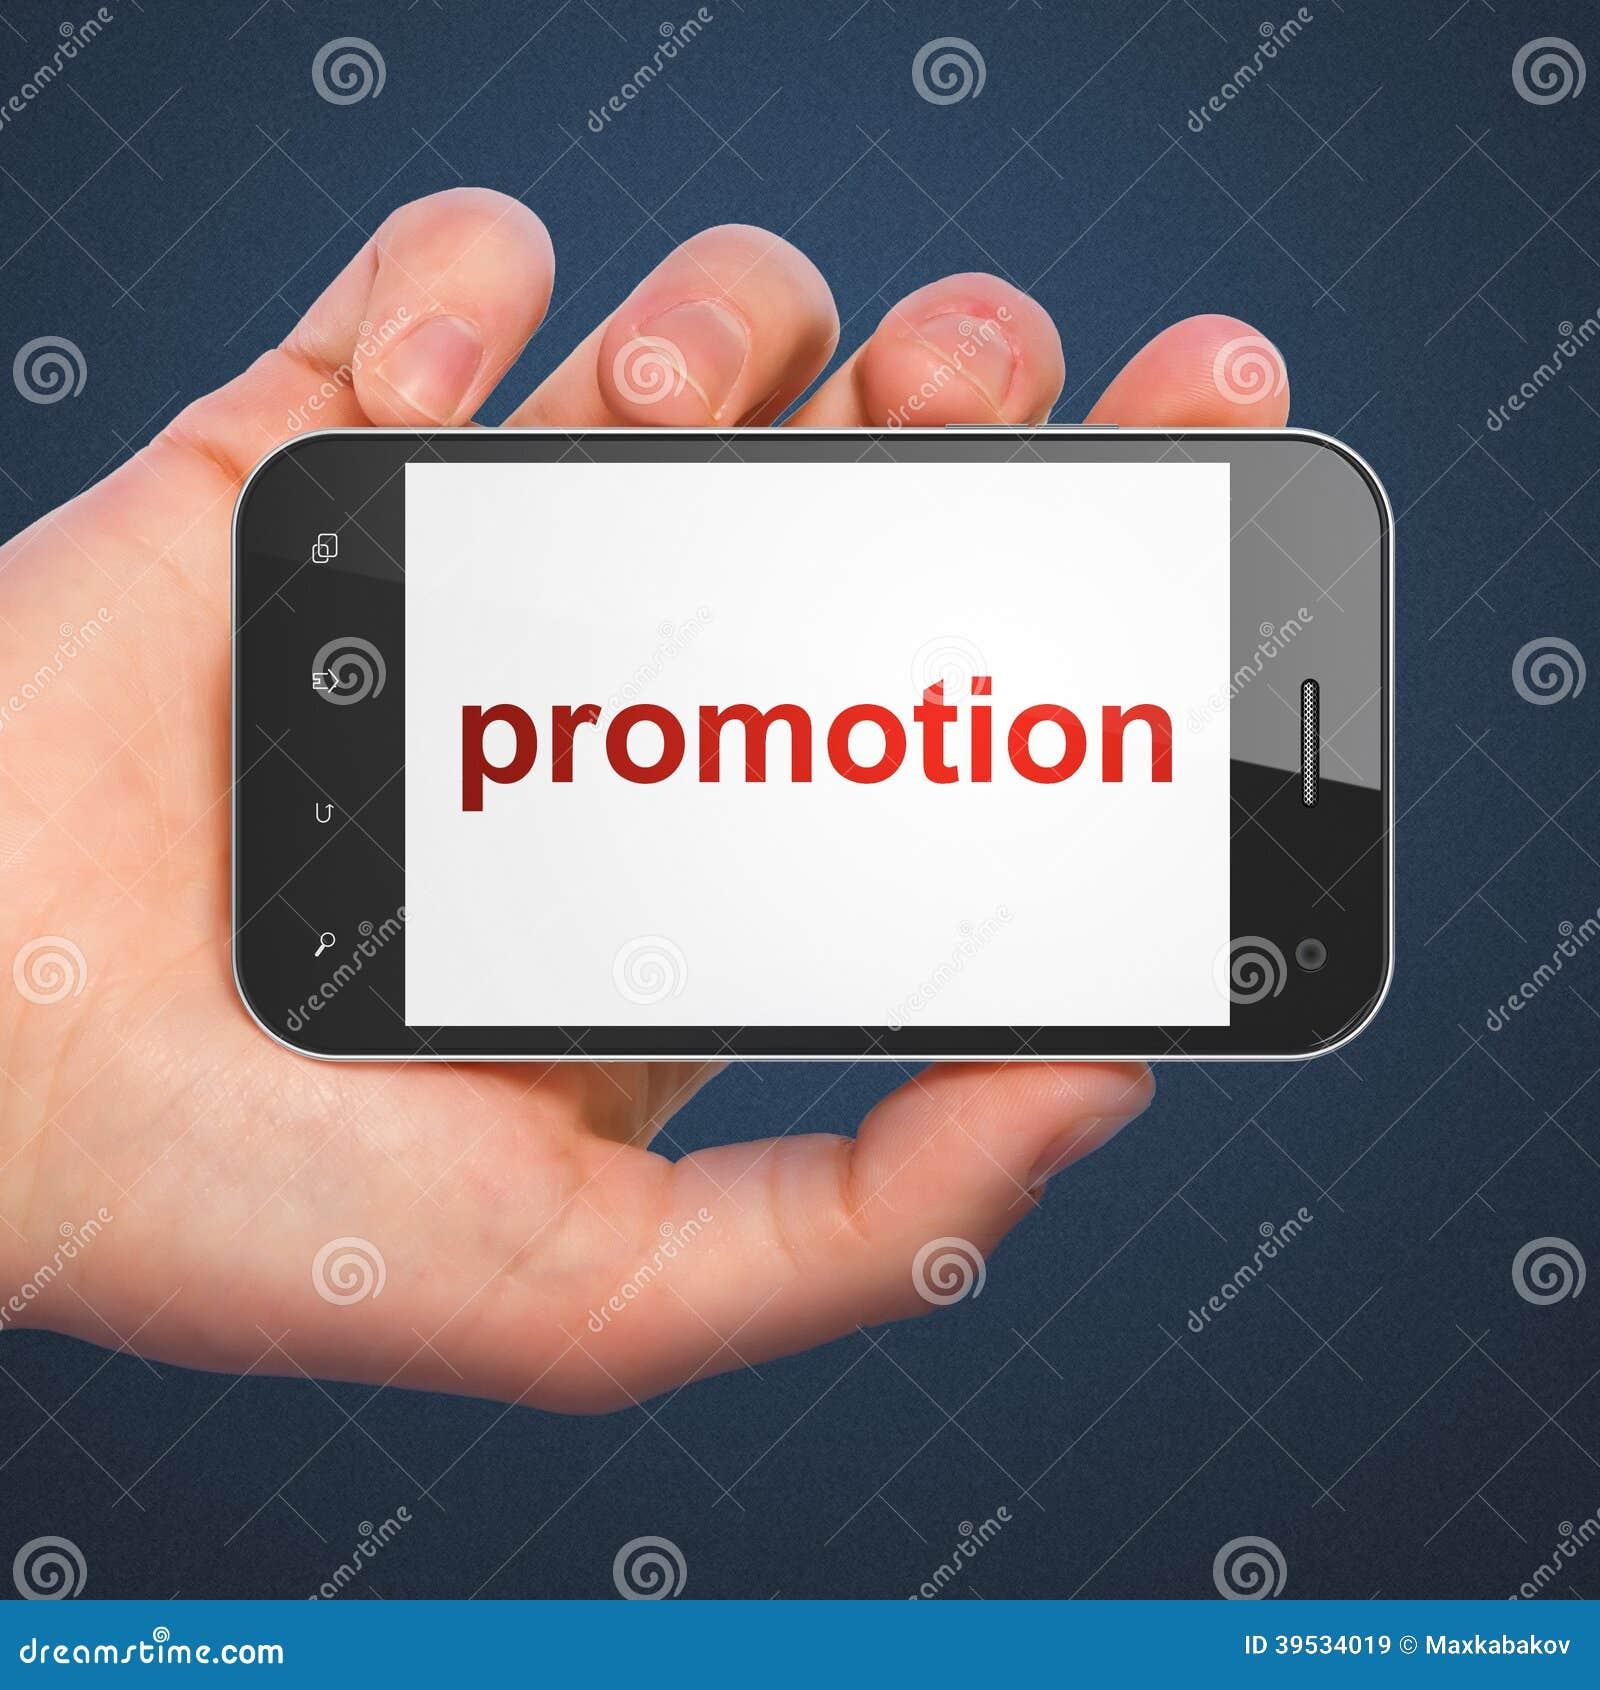 advertising concept promotion on smartphone stock photo image 39534019. Black Bedroom Furniture Sets. Home Design Ideas